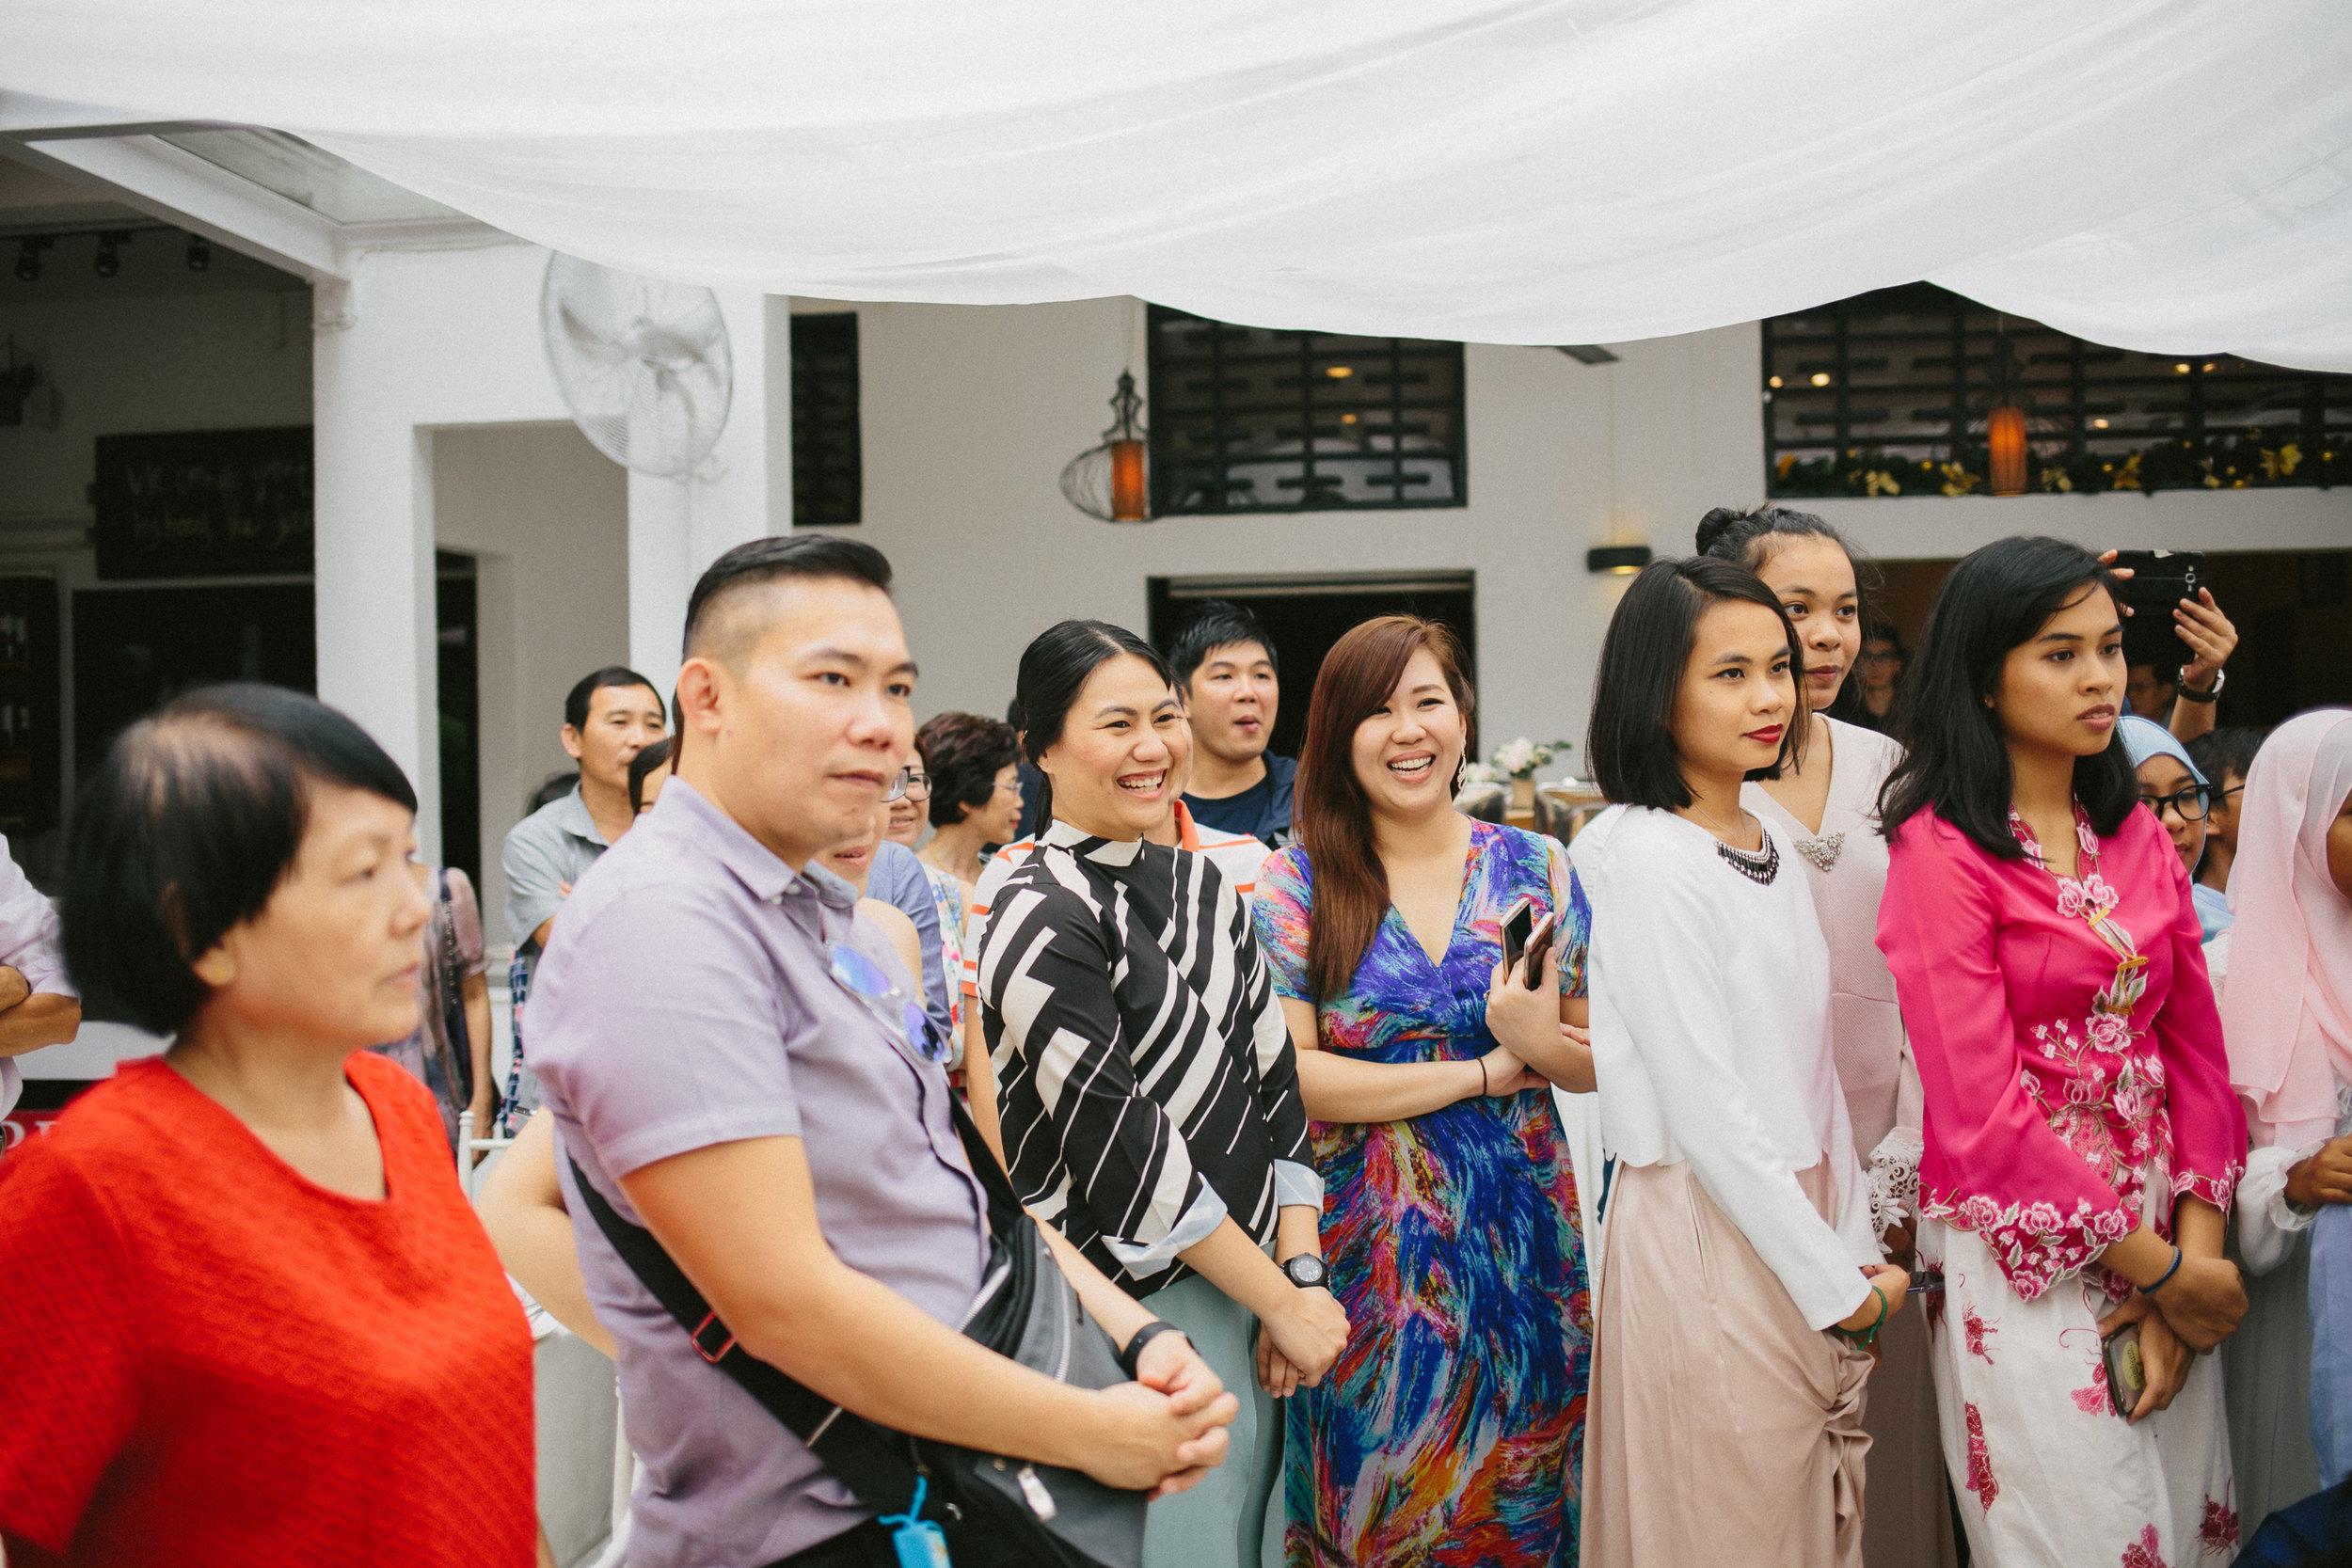 singapore-wedding-photographer-fadilah-kwan-064.jpg